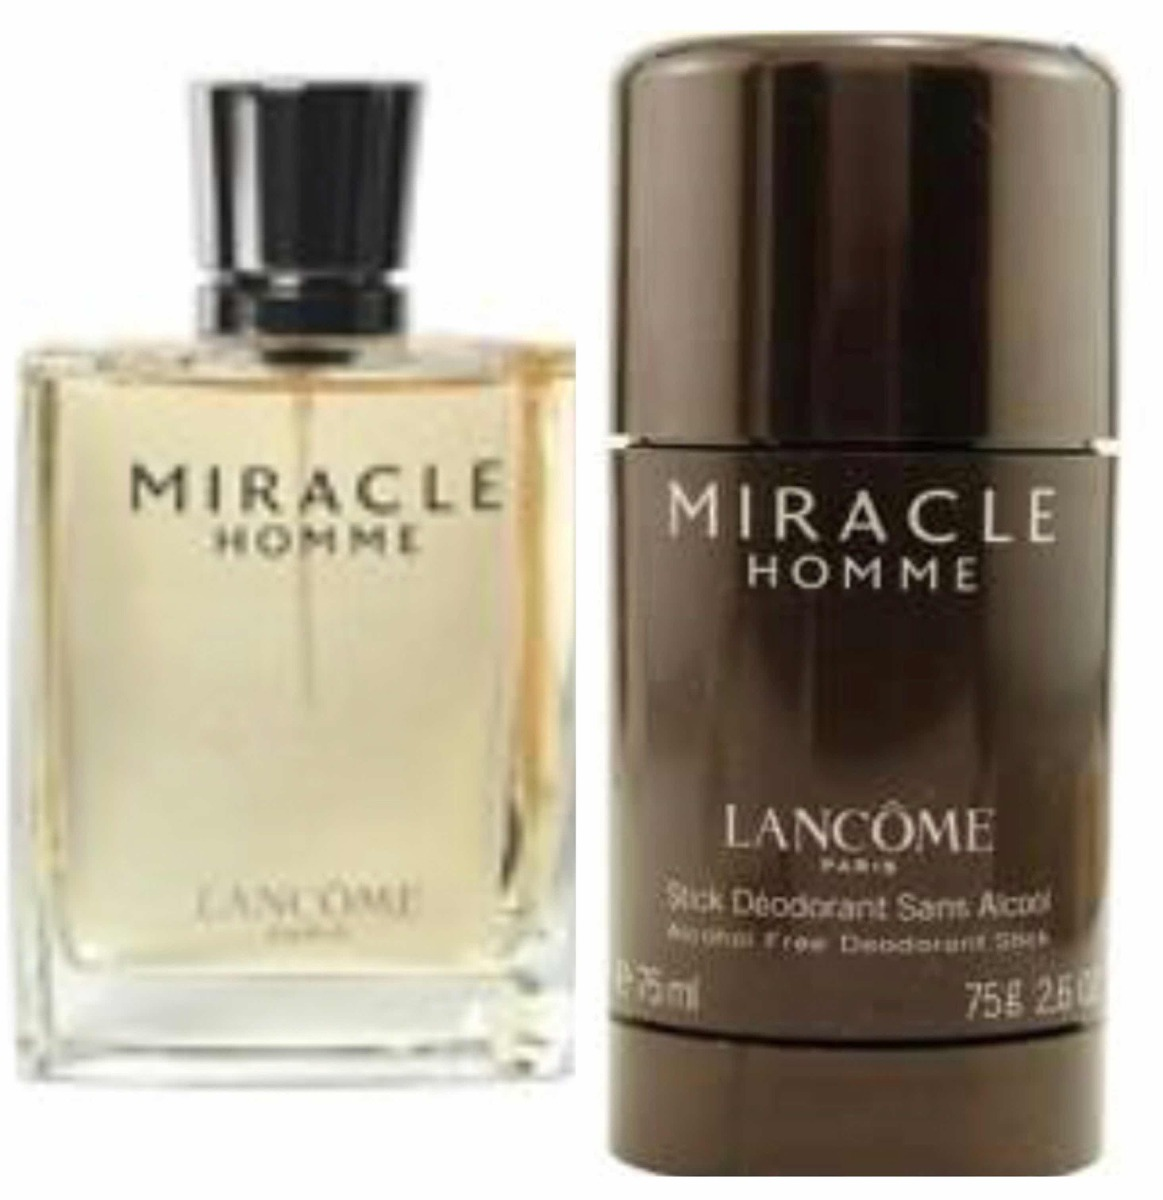 Miracle 2 Piezas Homme Perfume Lancomeset 8Ovm0NnywP